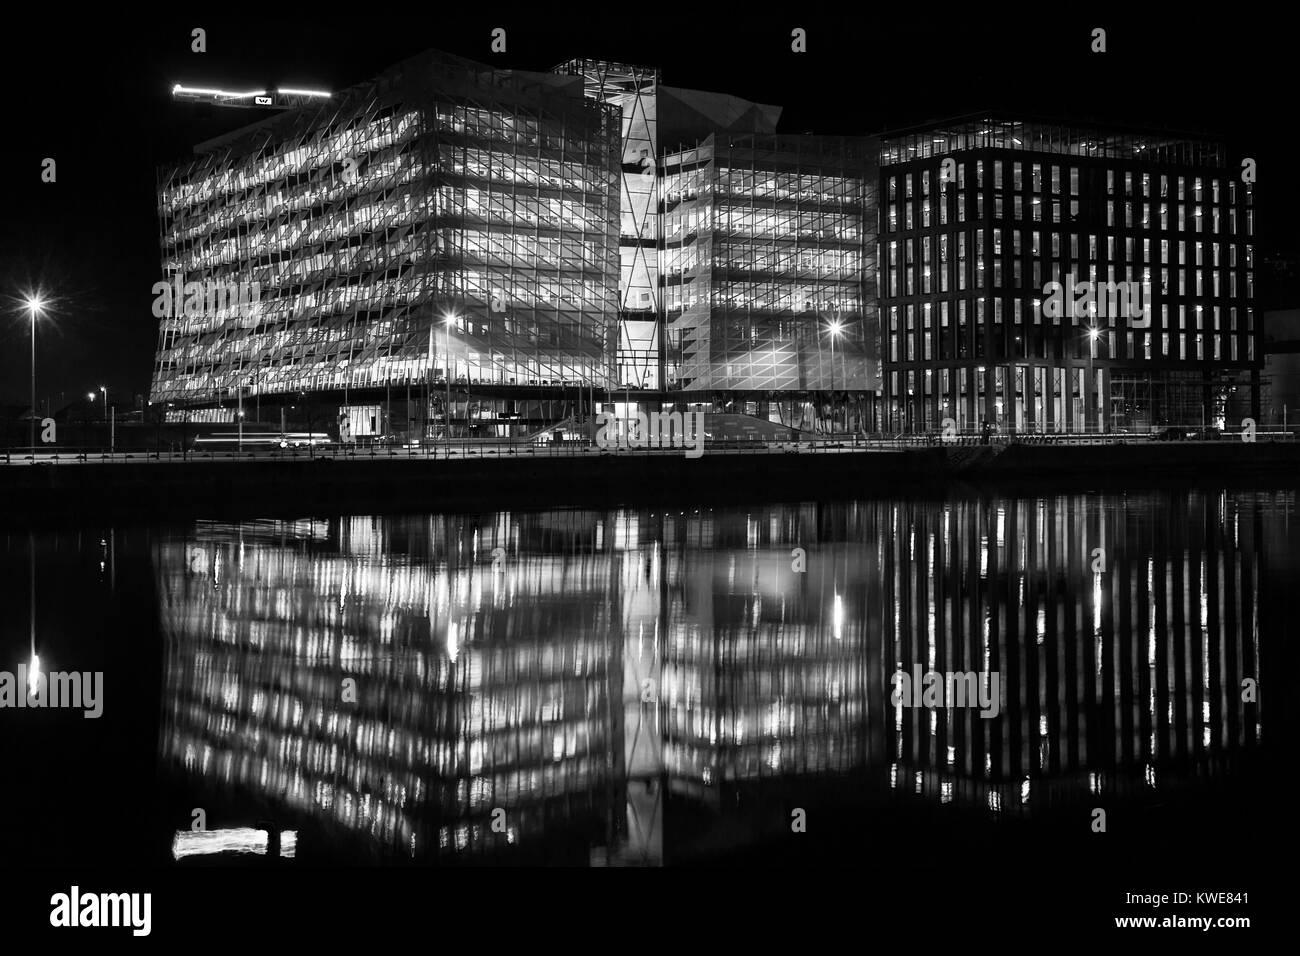 Central Bank, Dublin Docklands, Ireland - Stock Image